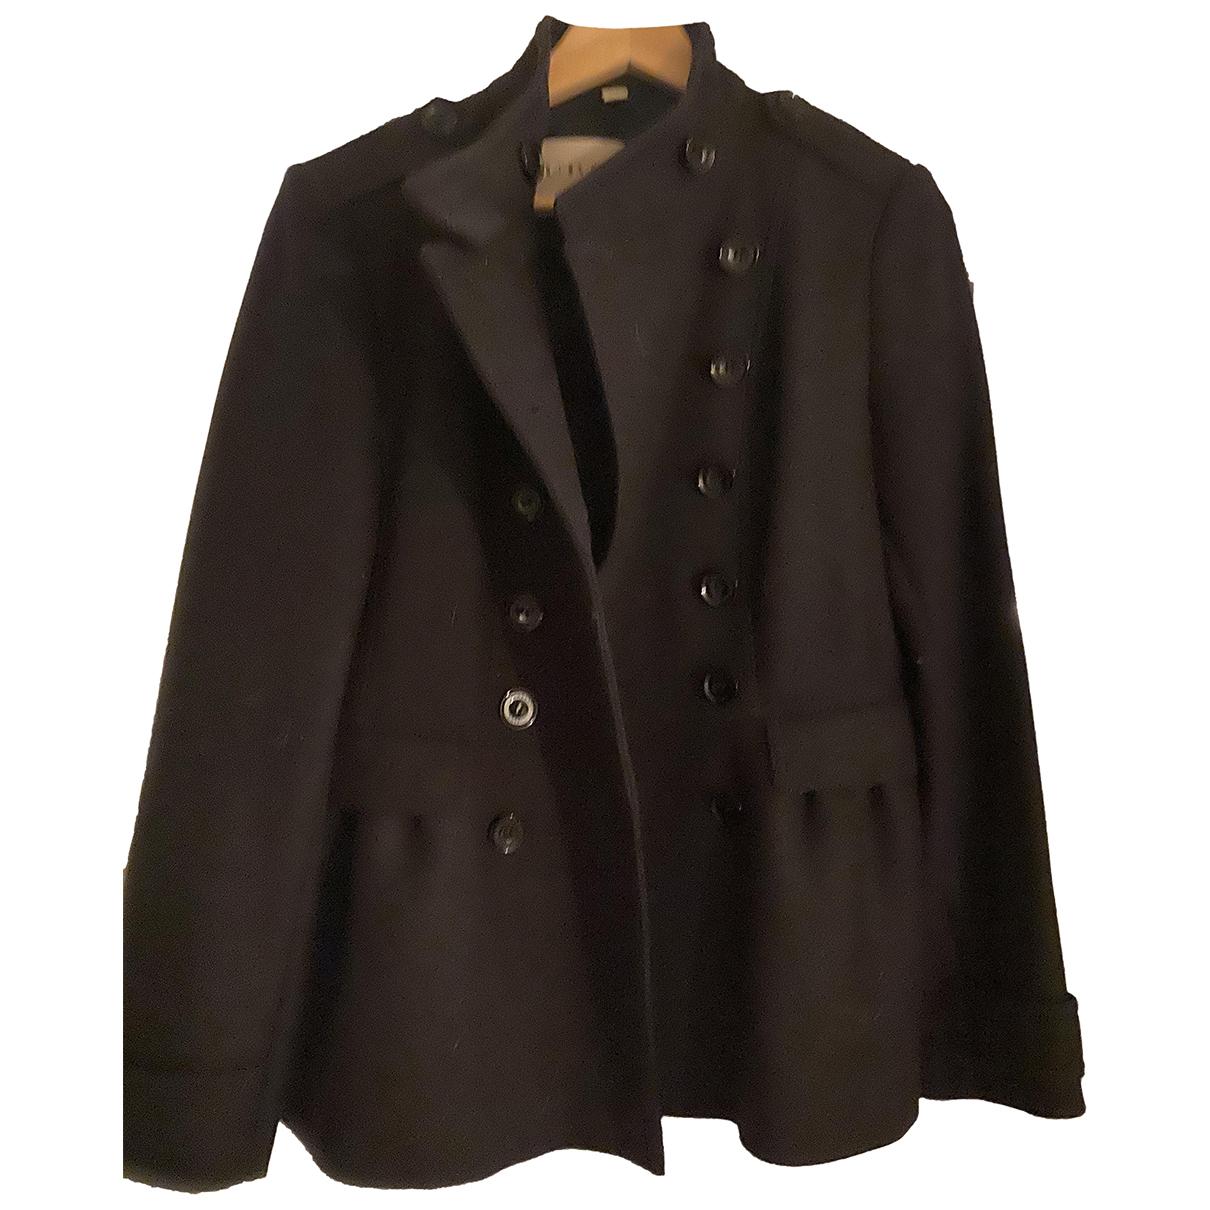 Burberry N Navy Wool coat for Women 8 US